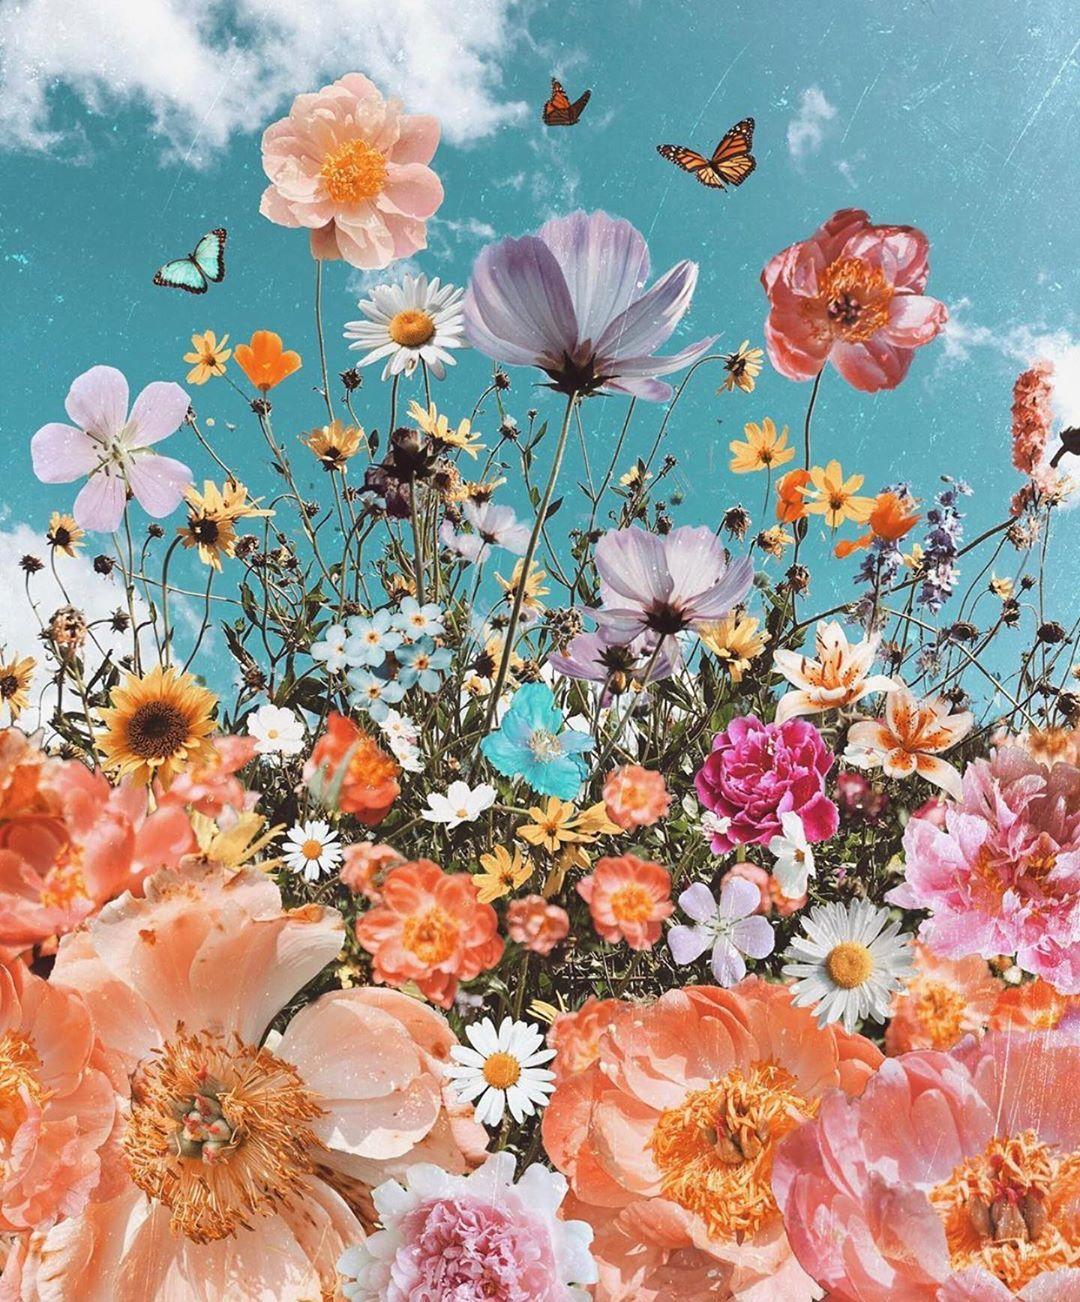 Gambar Mungkin Berisi Bunga Dan Tanaman Aesthetic Iphone Wallpaper Flower Wallpaper Photo Wall Collage